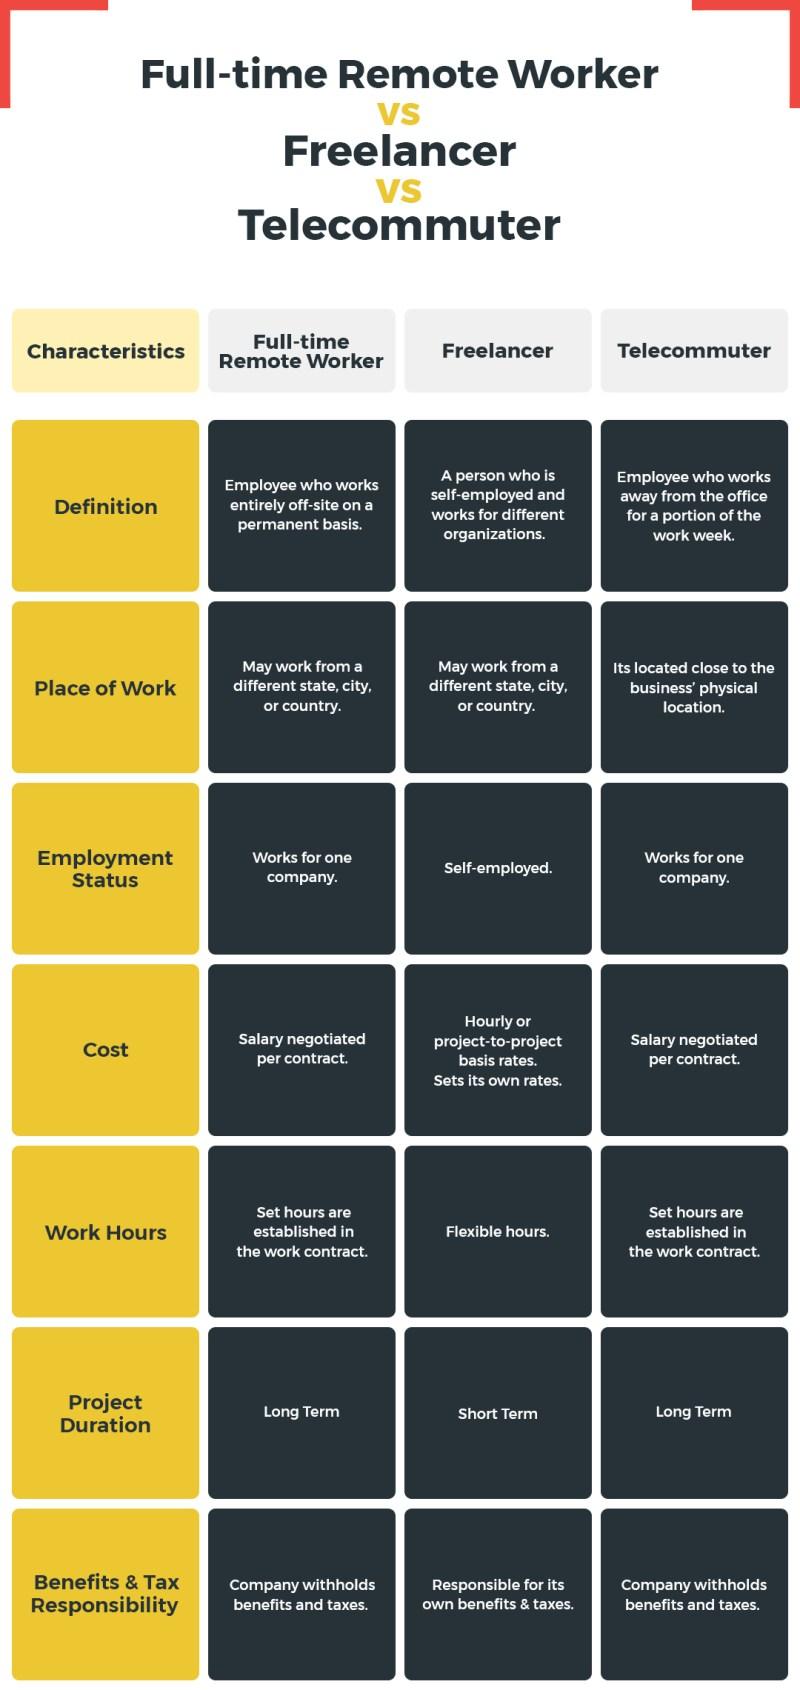 Full time remote worker versus freelancer versus telecommuter